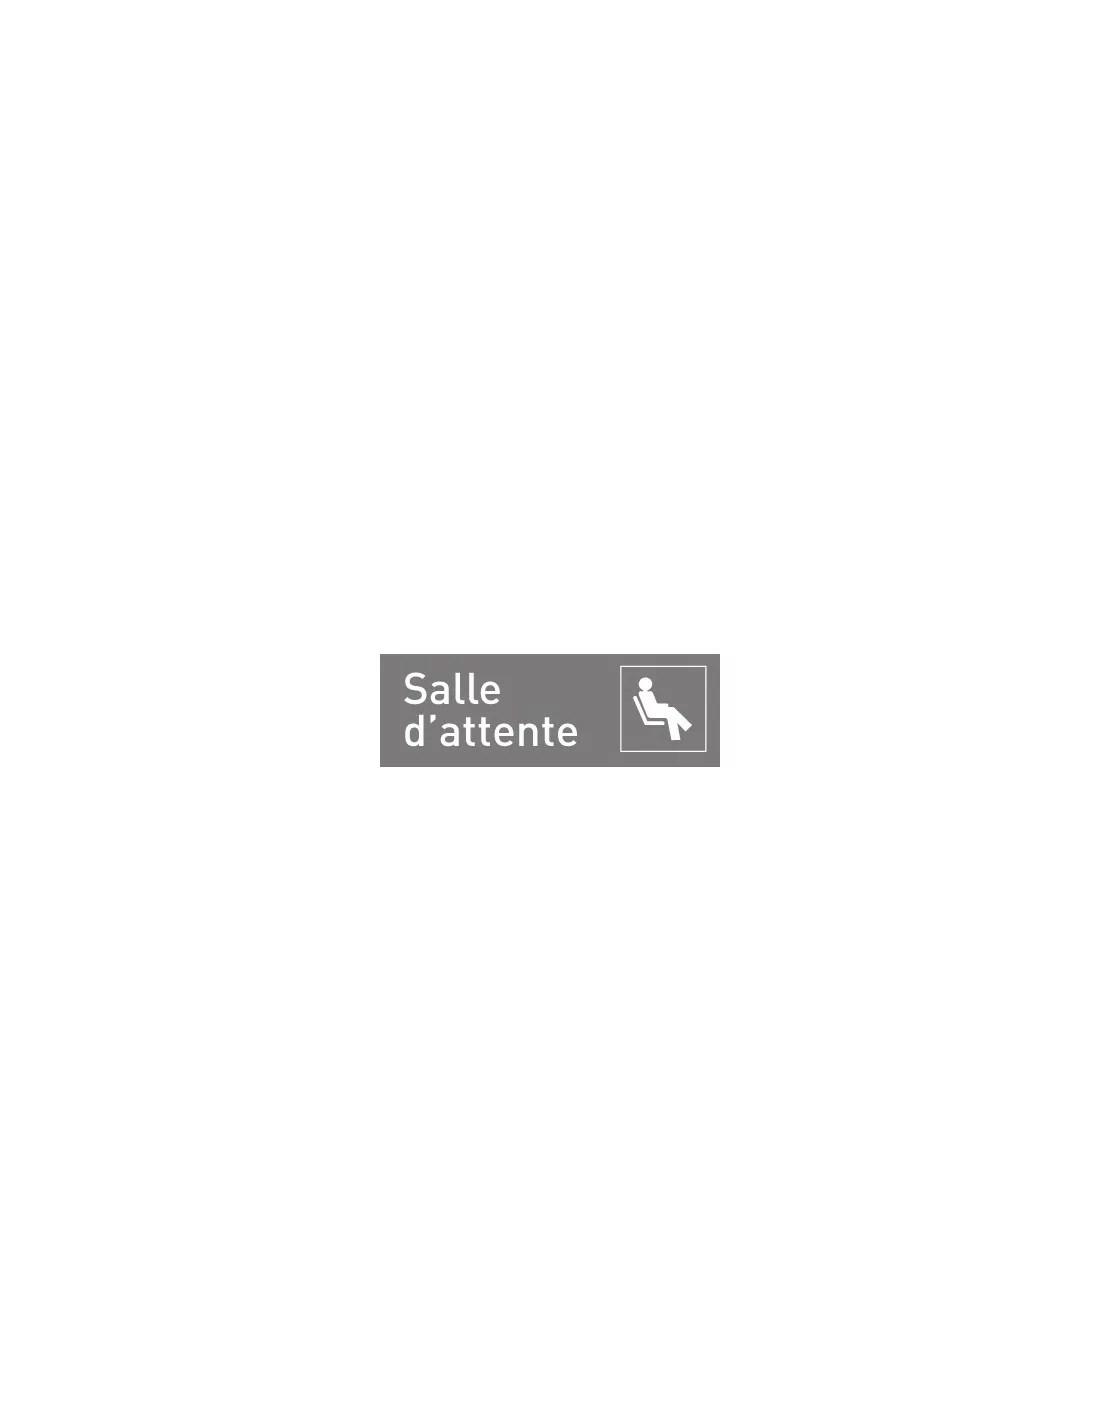 Panneau Salle Dattente Signalisation Et Affichage